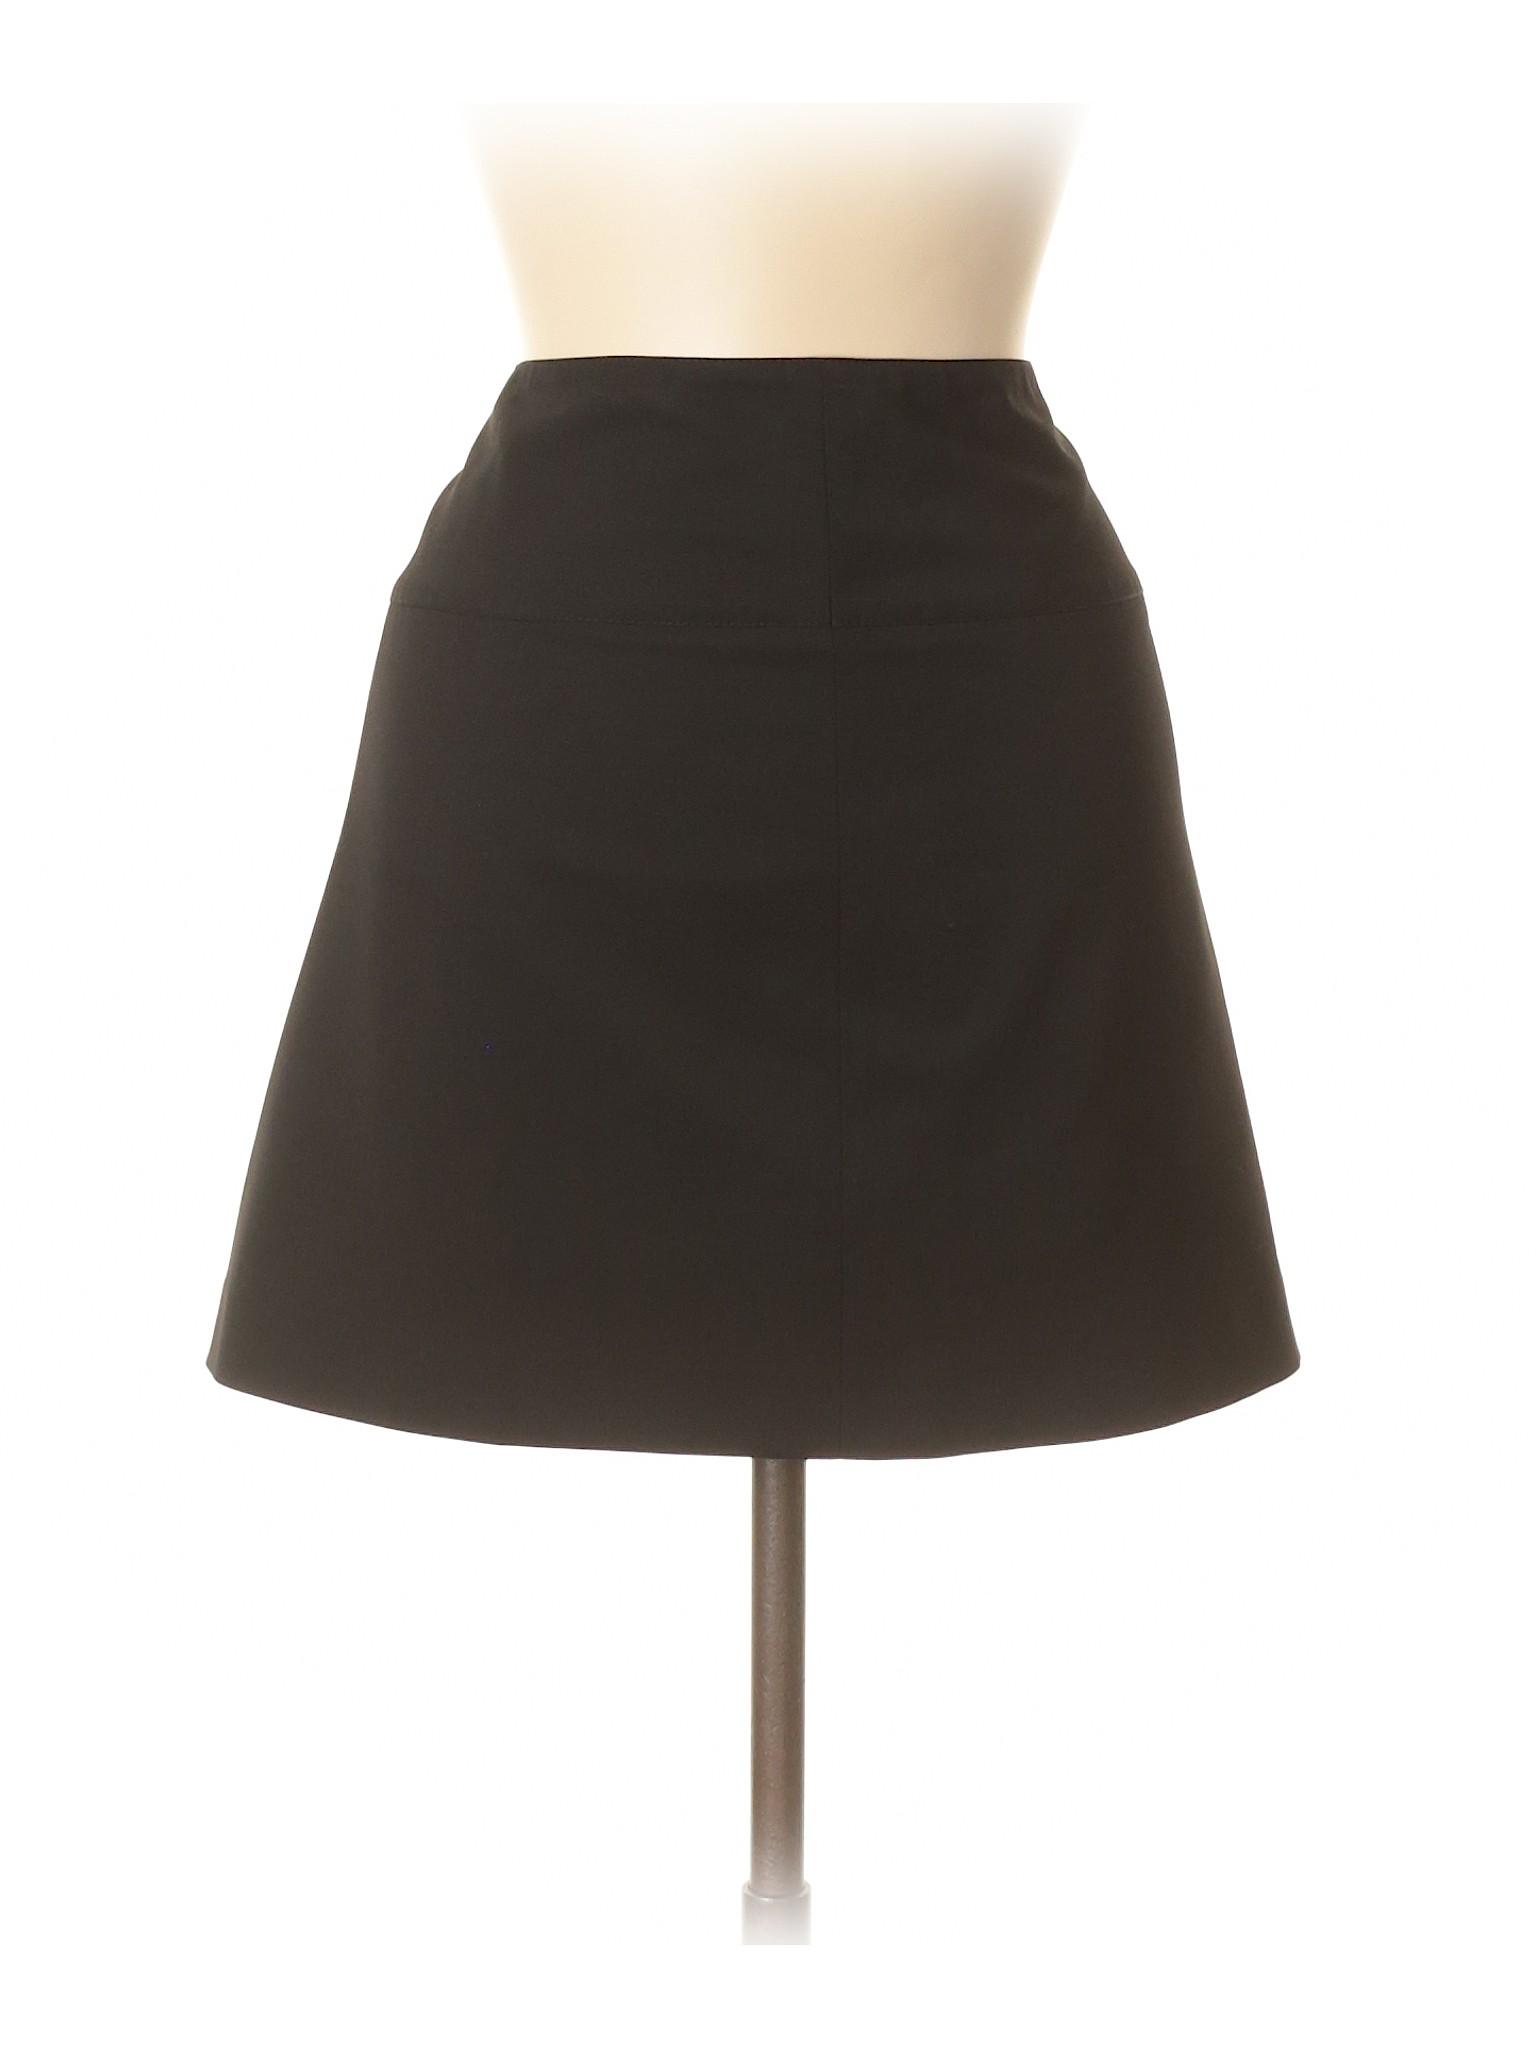 Boutique Casual Boutique Casual Boutique Skirt Skirt Skirt Casual Skirt Boutique Casual EFpqR